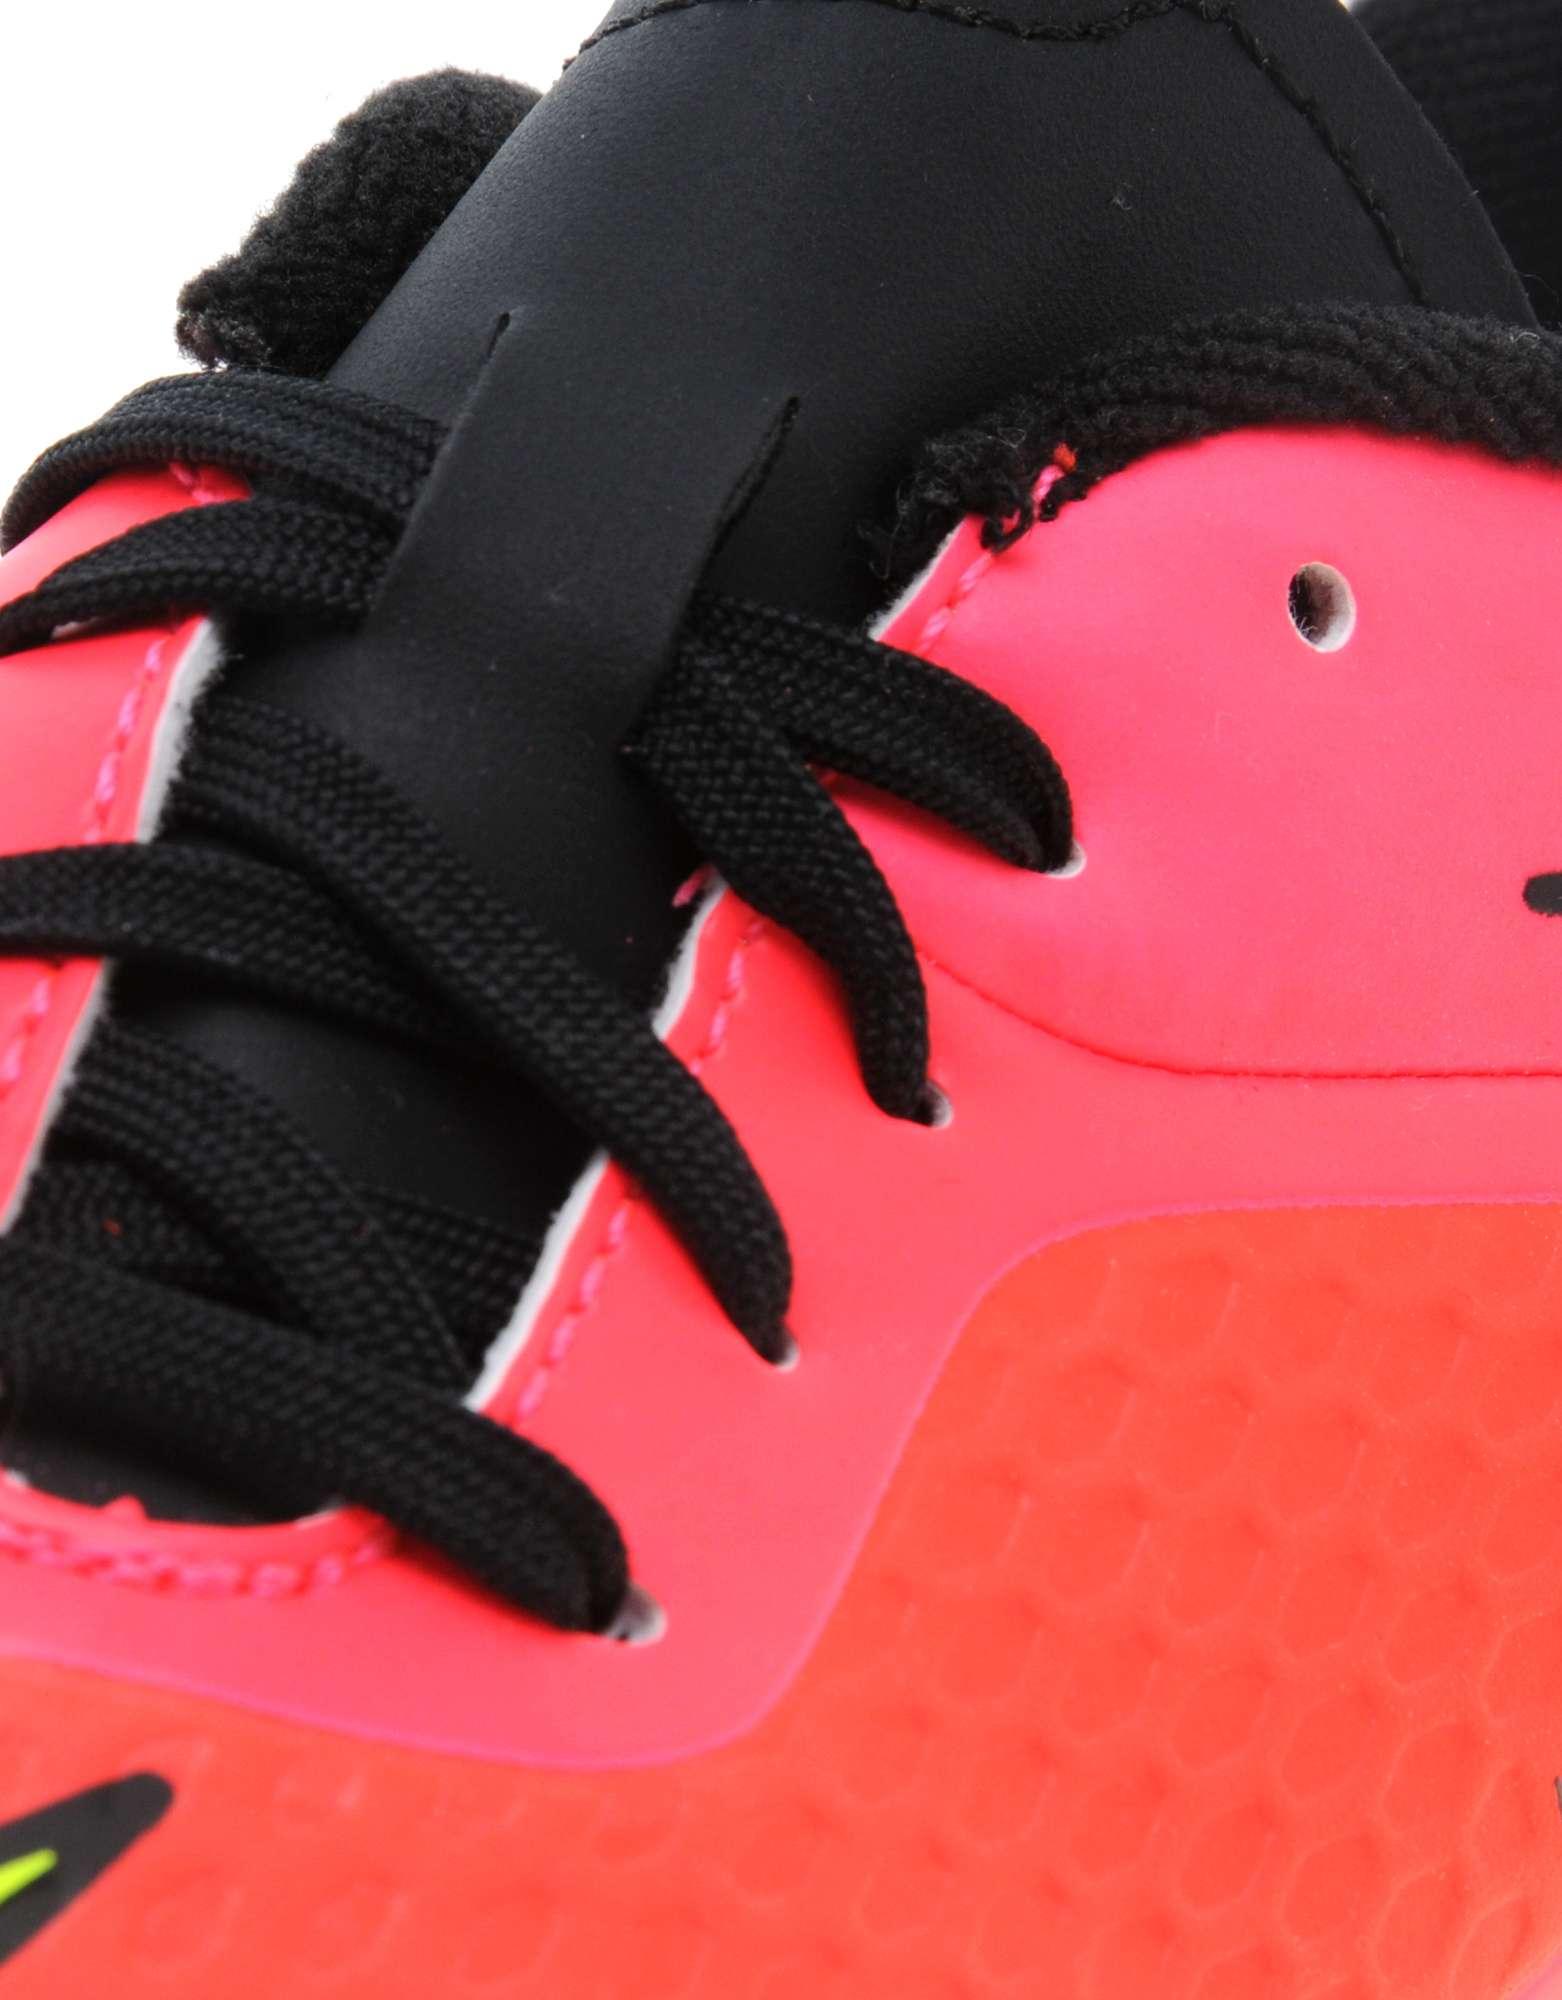 Nike Hypervenom Phelon Artificial Ground Childrens